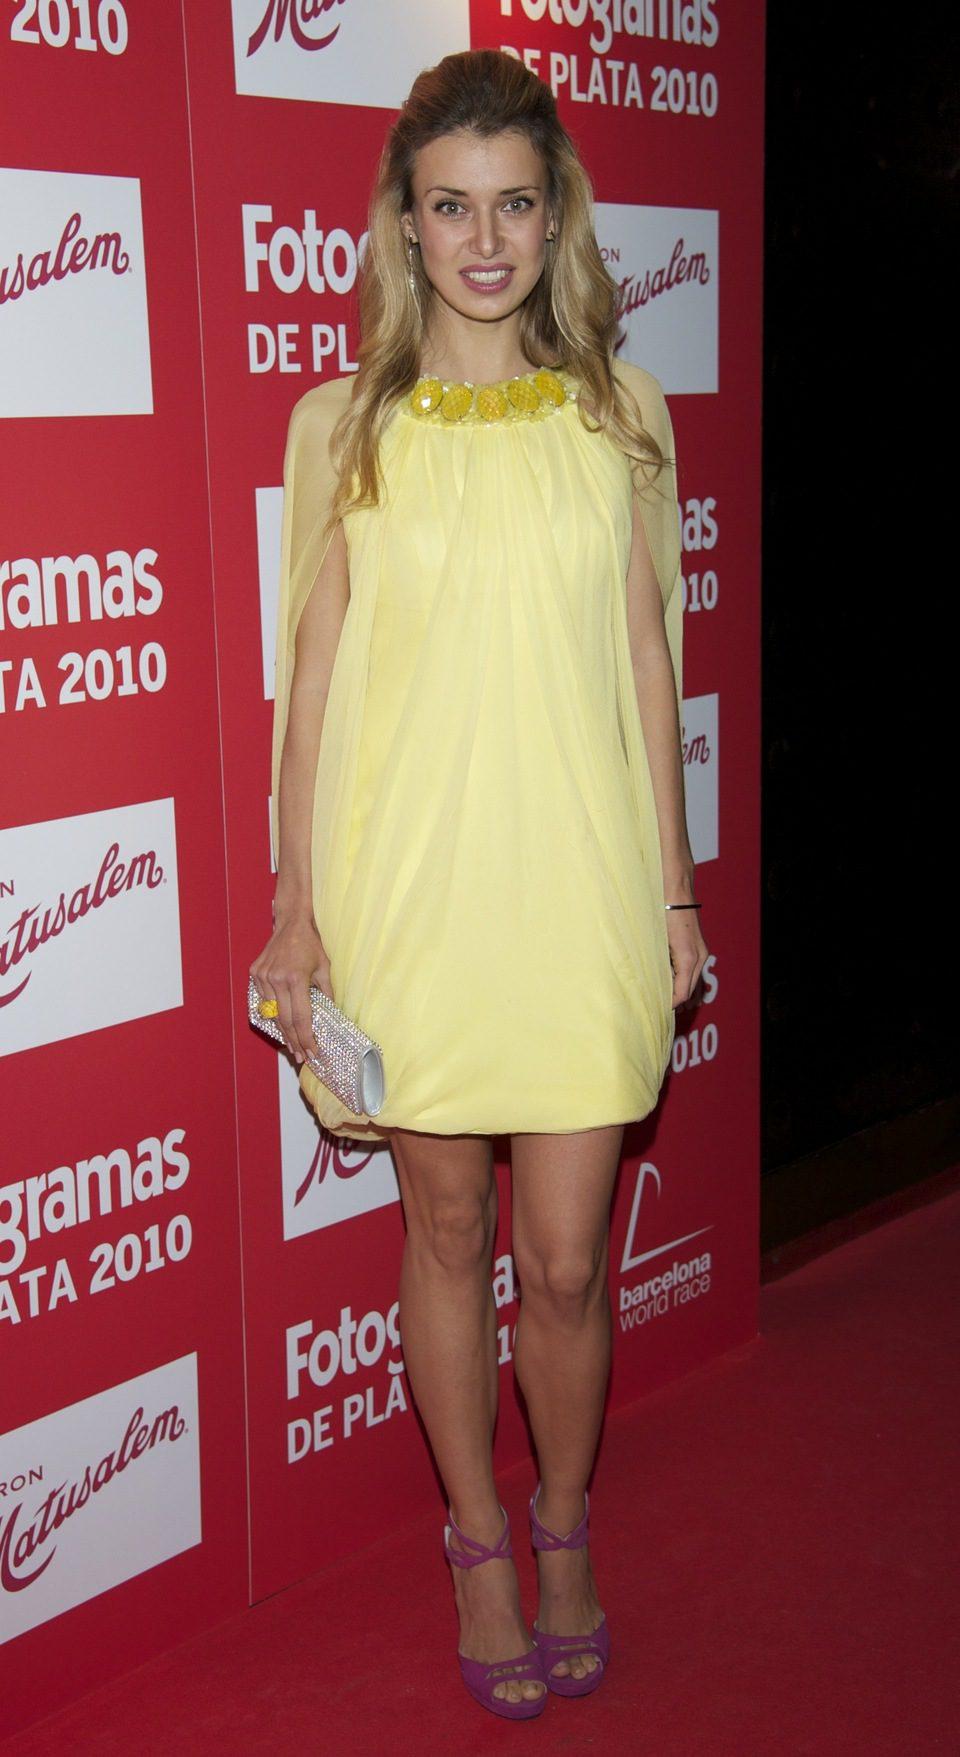 Natasha Yarovenko en los Fotogramas 2010